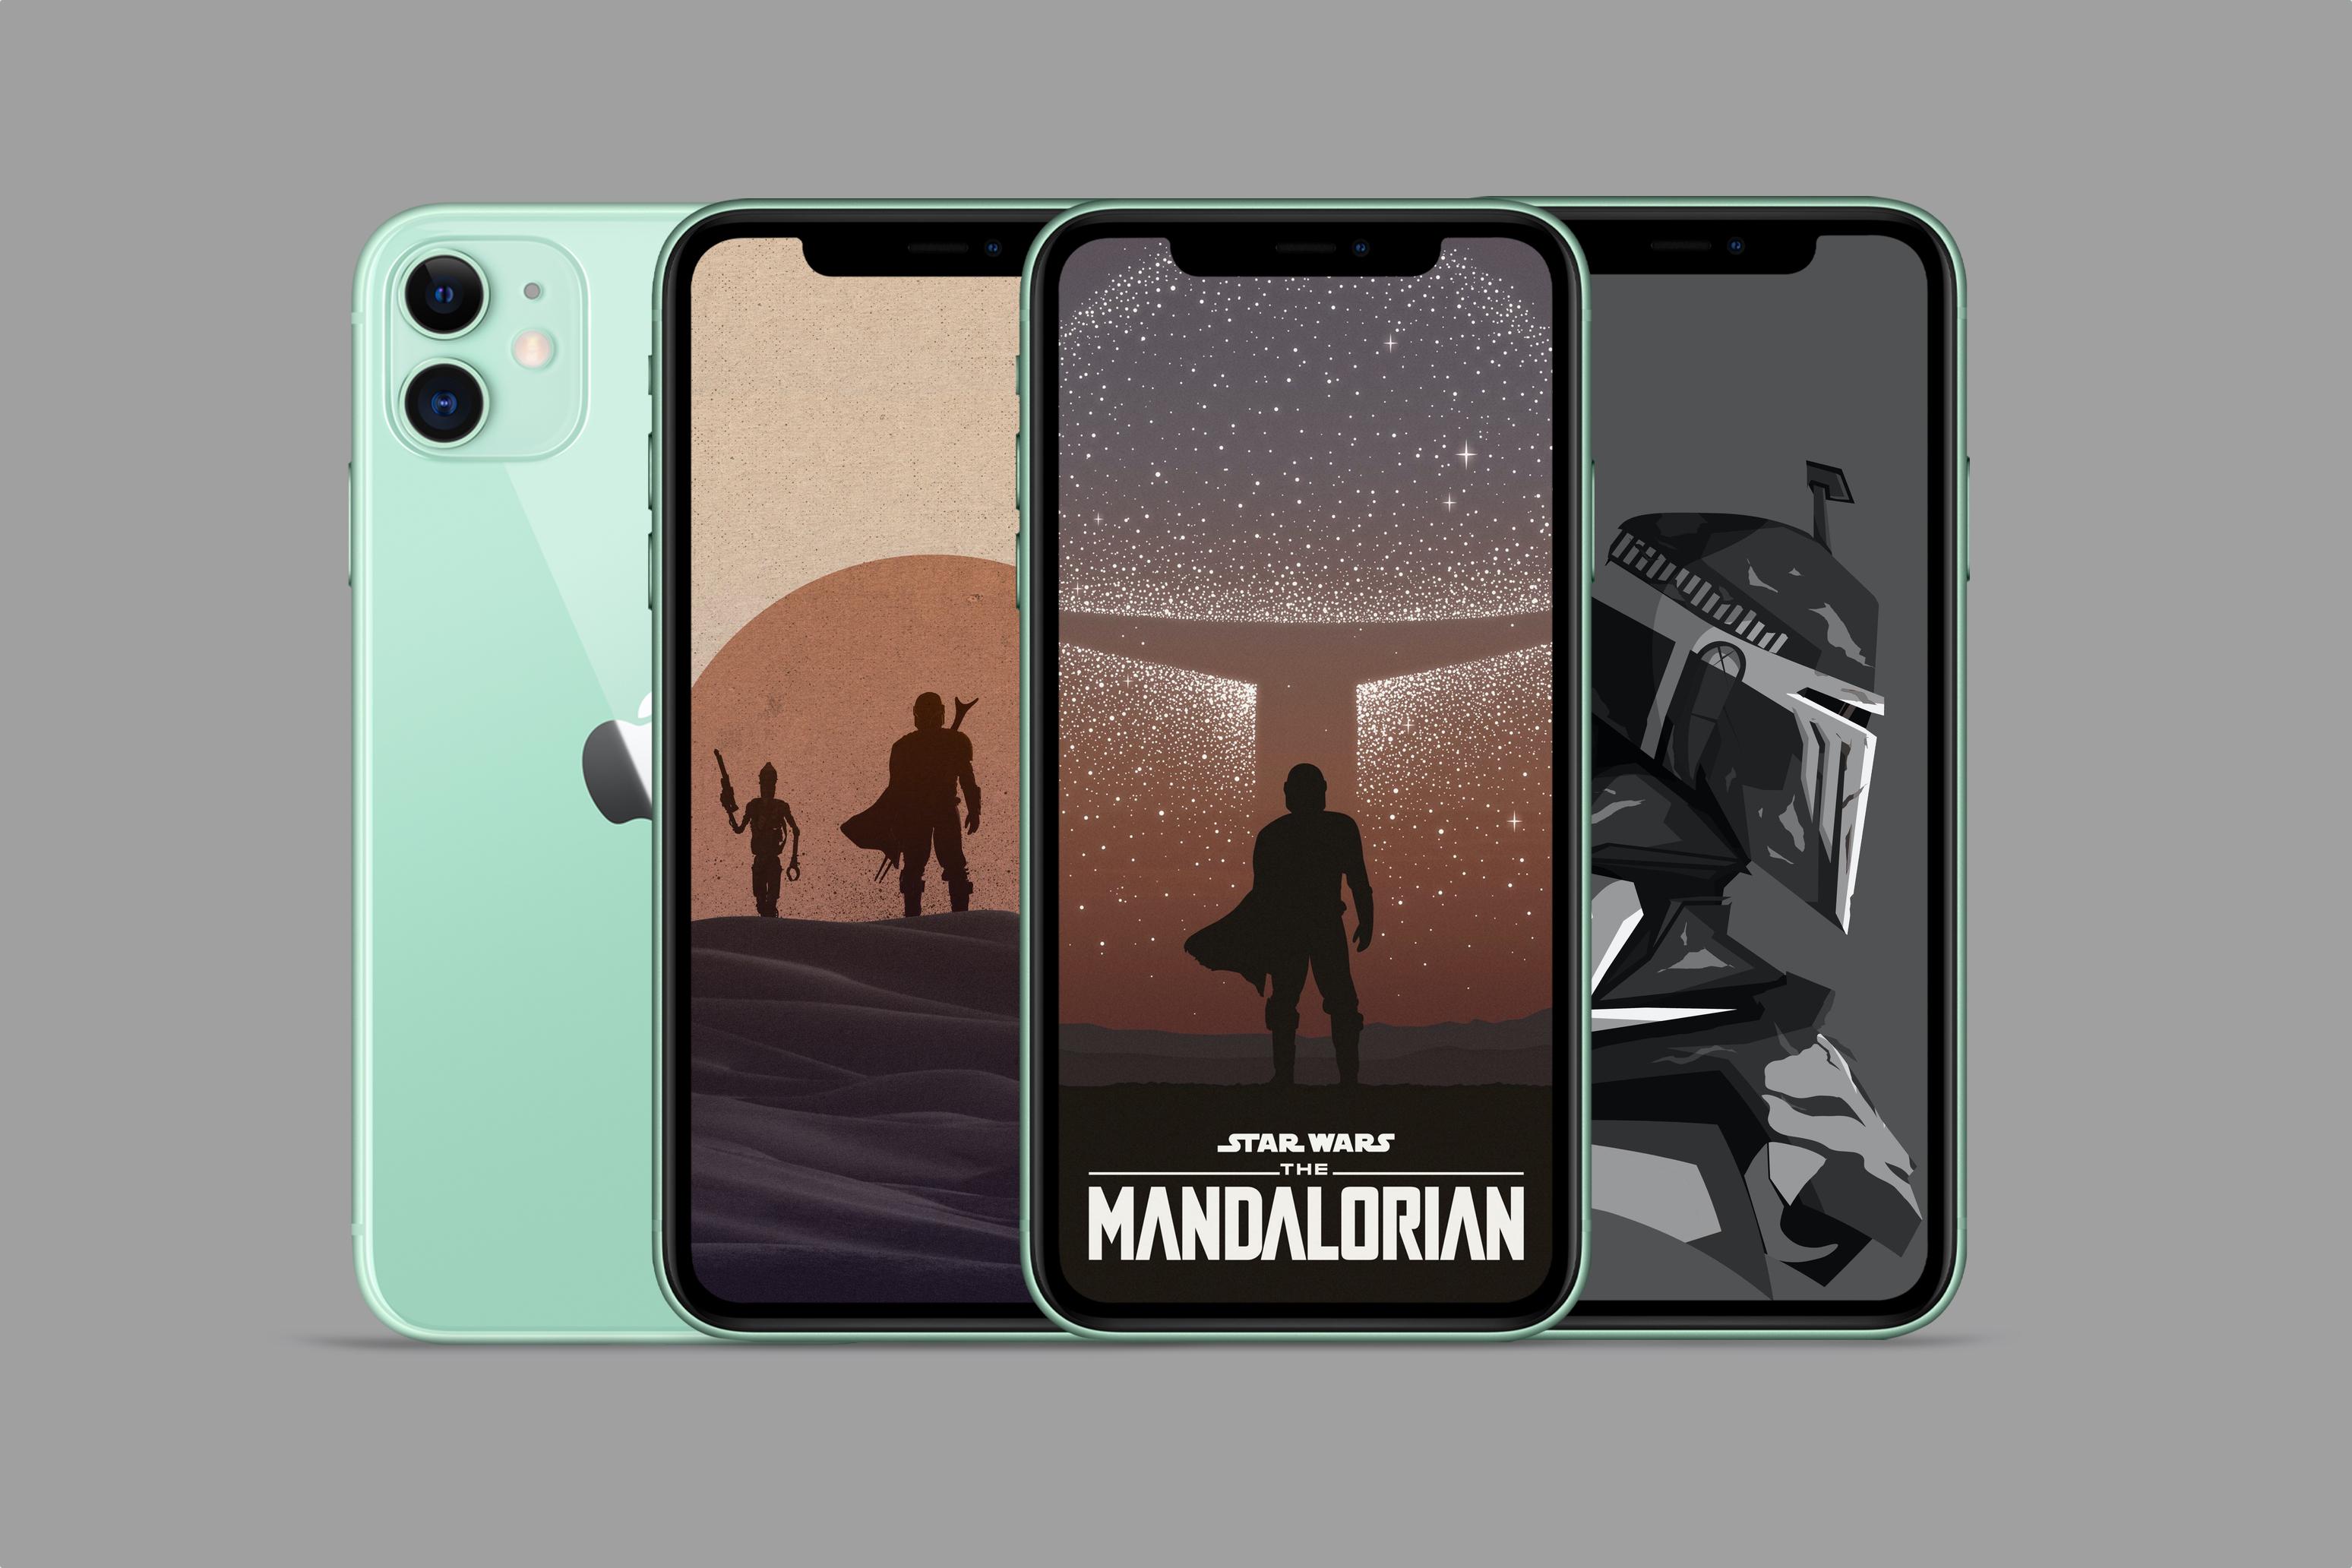 The Mandalorian iPhone wallpapers 3096x2064